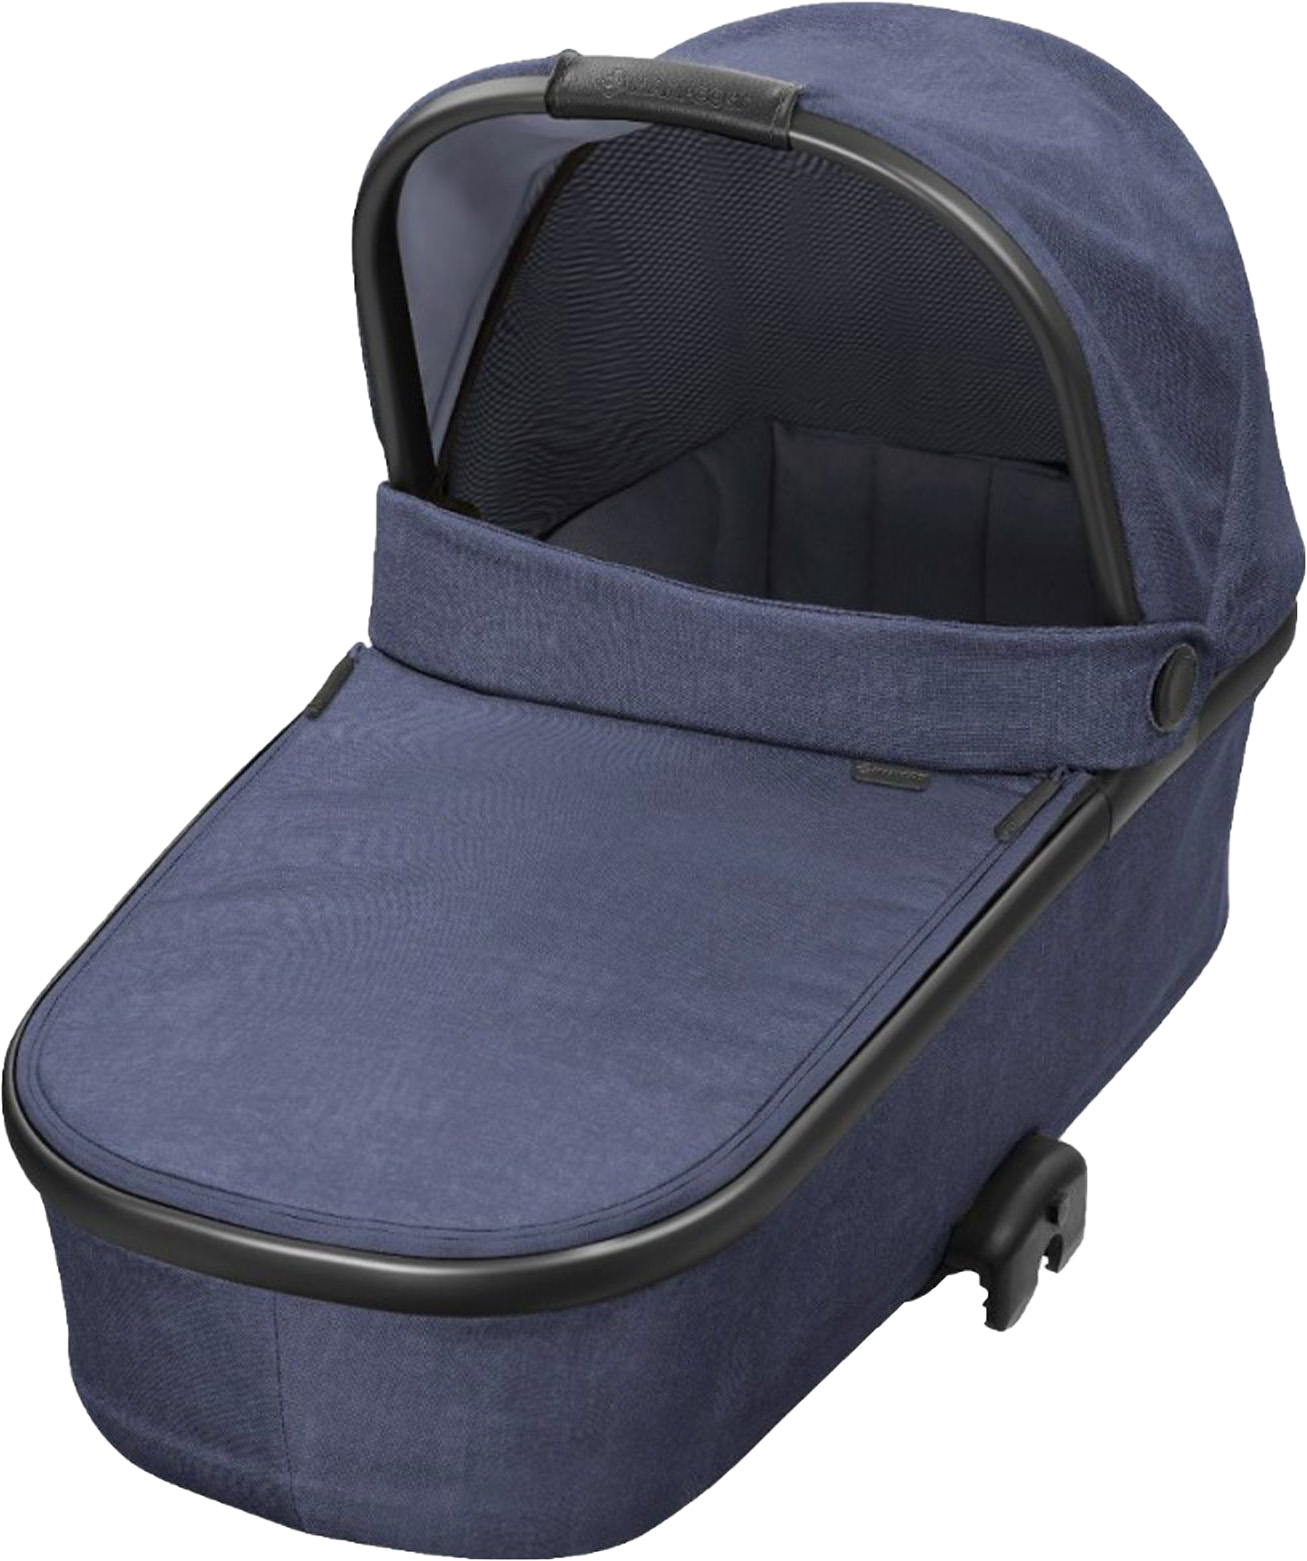 цена Люлька для коляски Bebe Confort 90644 темно-синий в интернет-магазинах